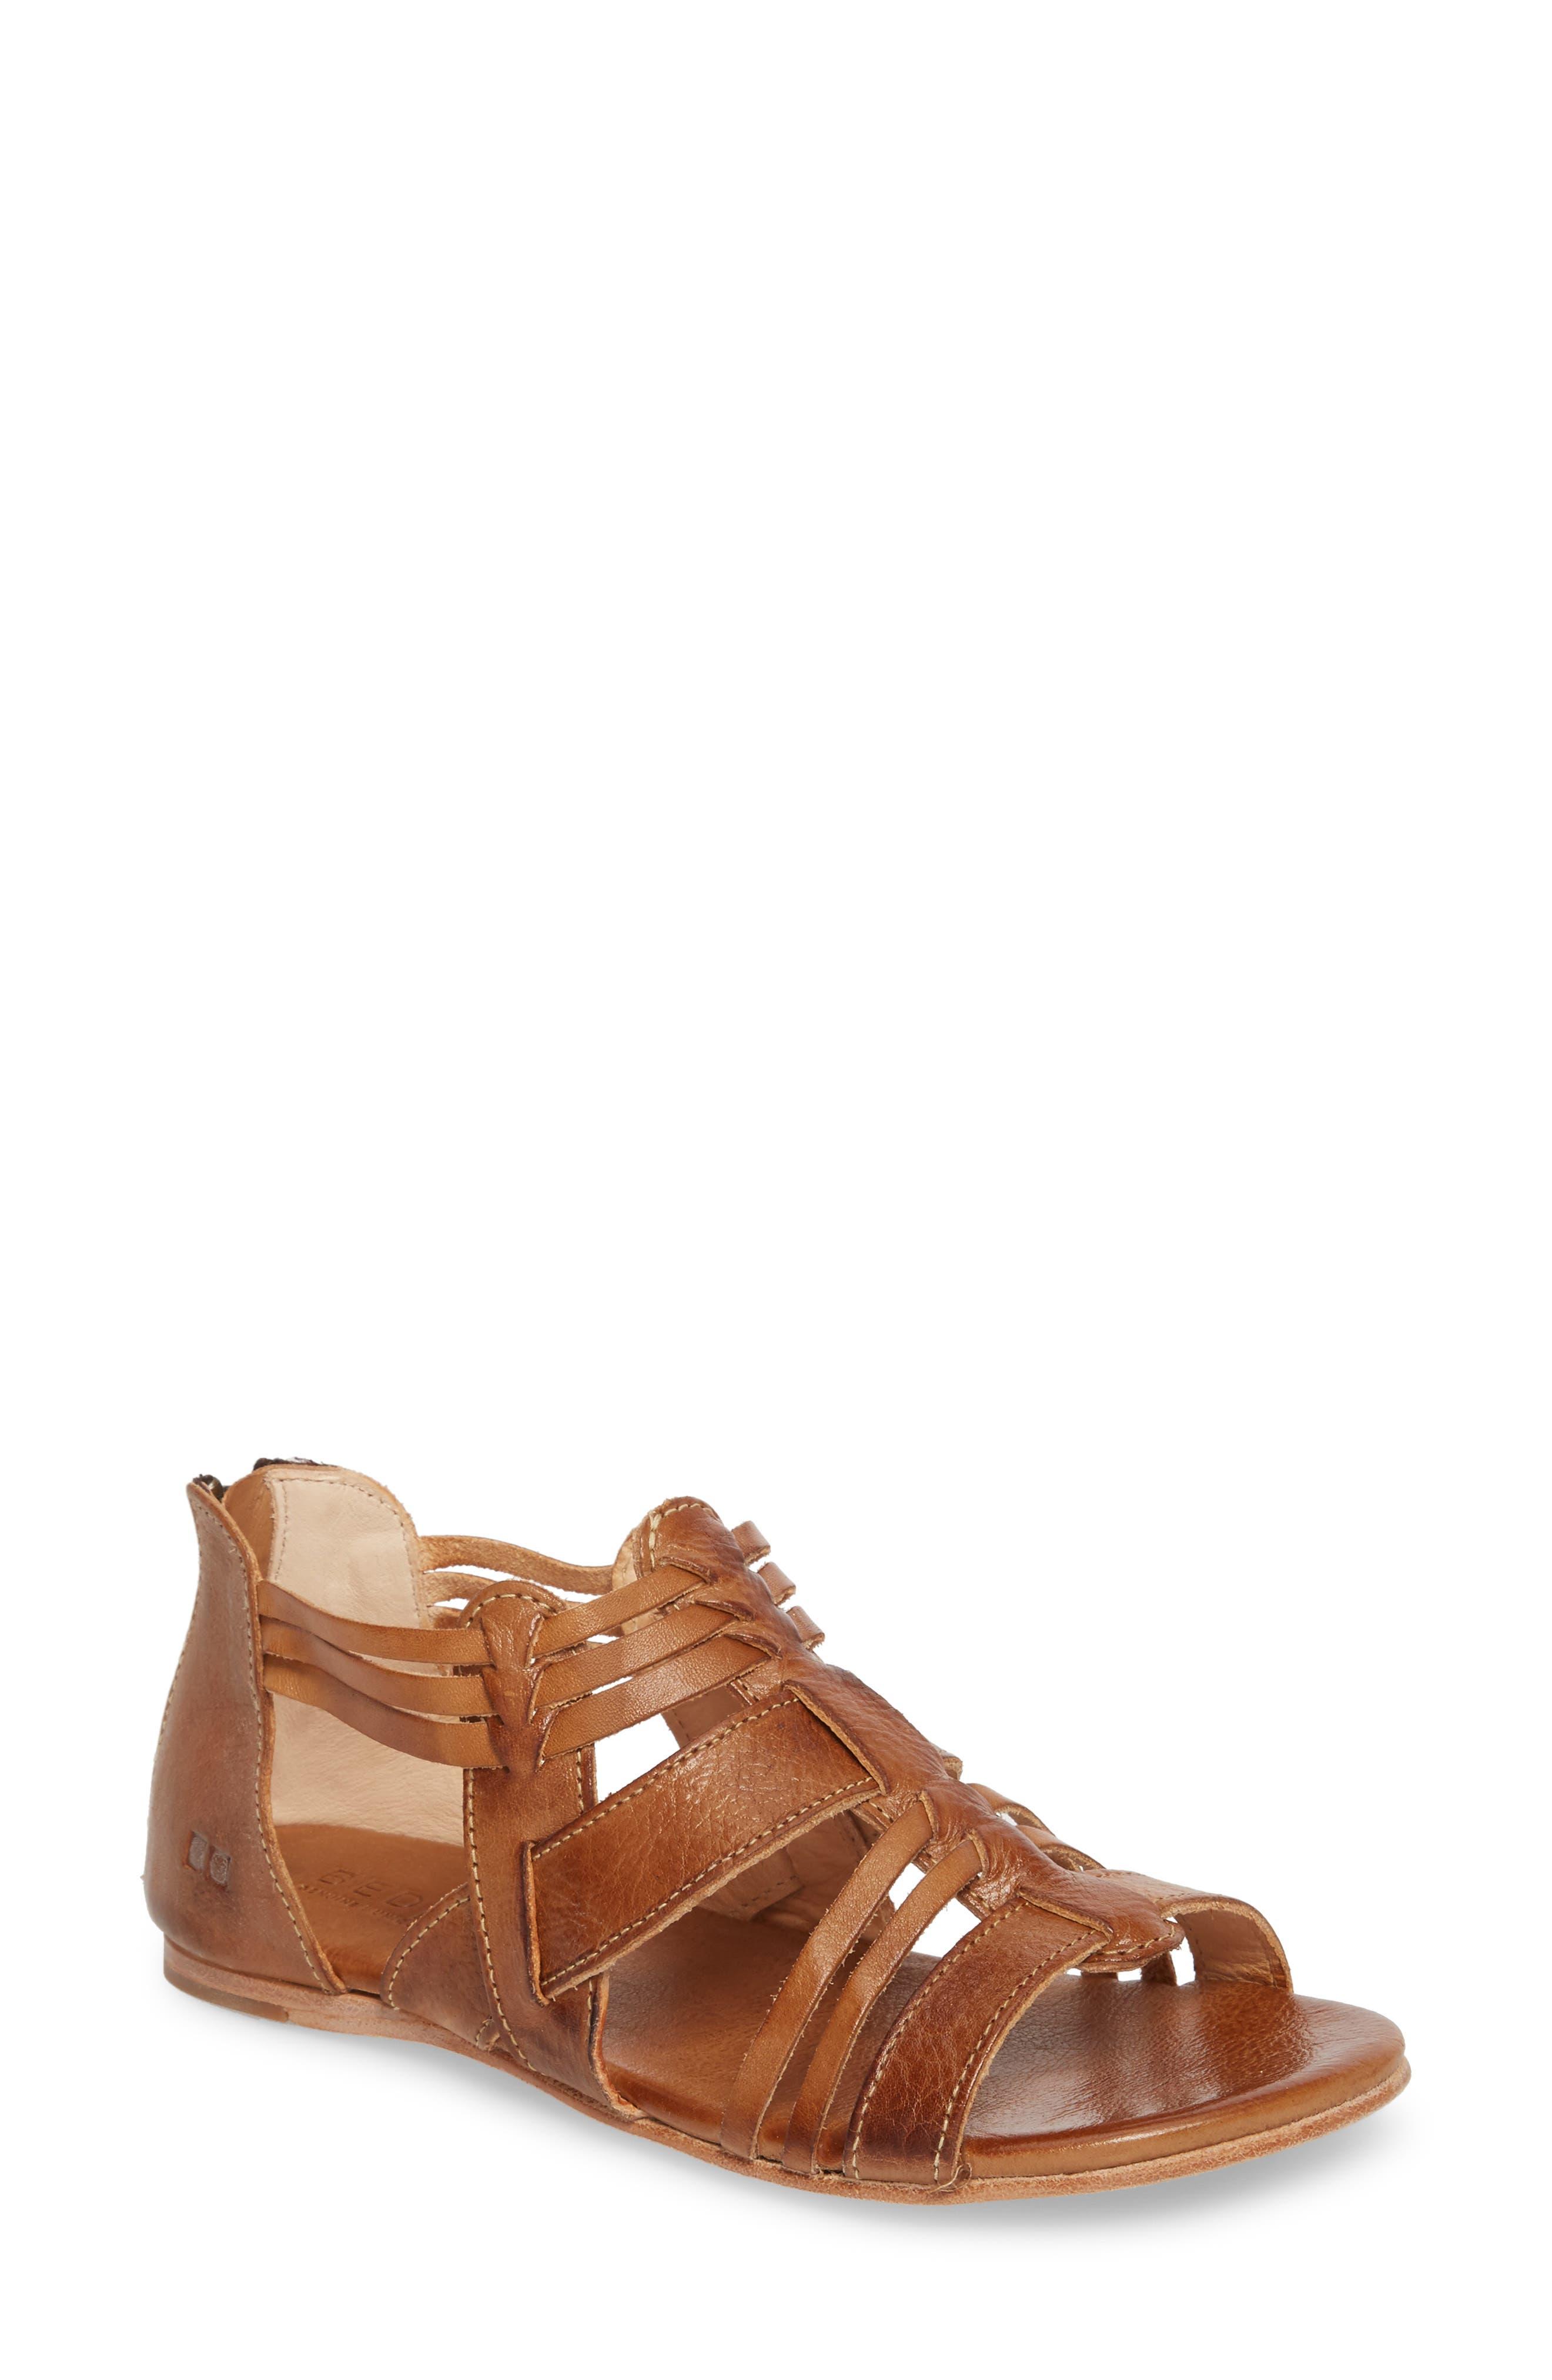 Cara Sandal,                             Main thumbnail 1, color,                             Tan Leather